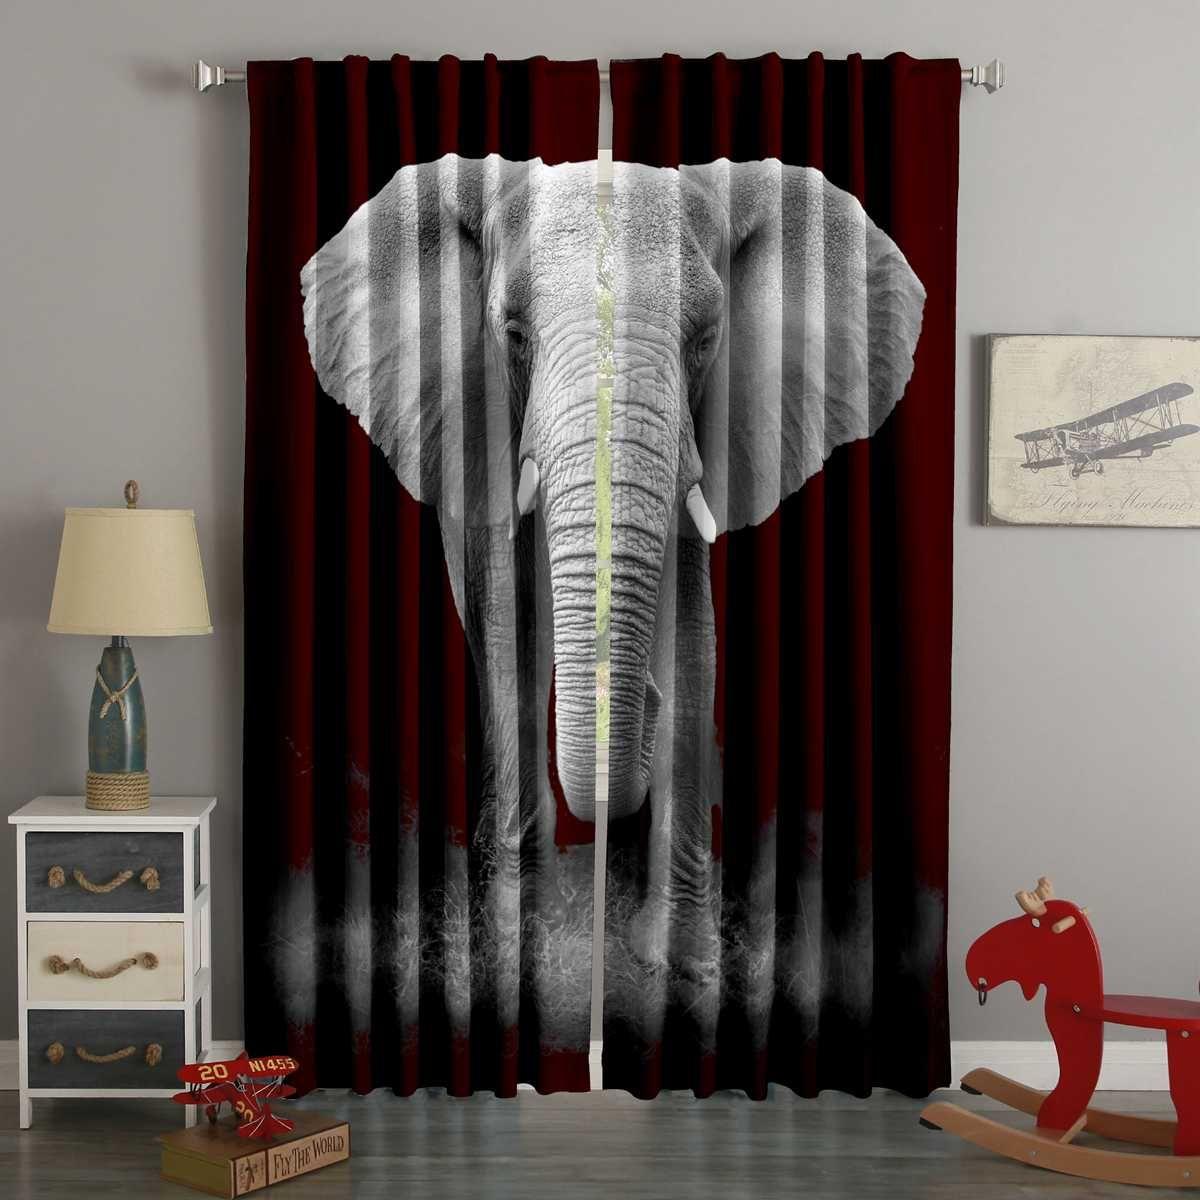 3d Printed Elephant Style Custom Living Room Curtains Elephant Home Decor Curtains Living Room Curtains #printed #living #room #curtains